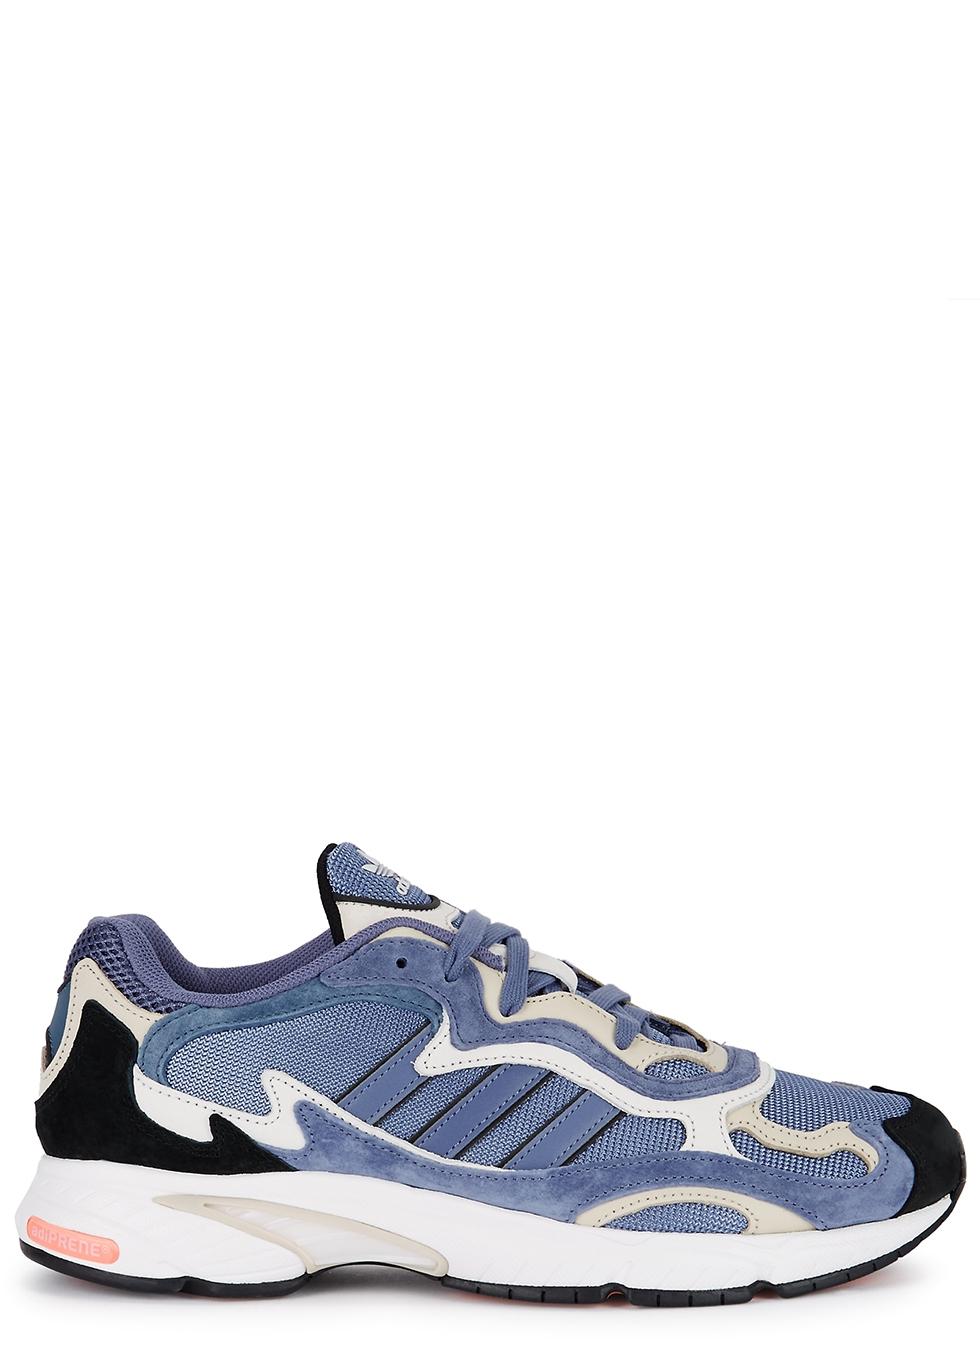 238e04fcef41 Men s Designer Shoes - Men s Footwear - Harvey Nichols